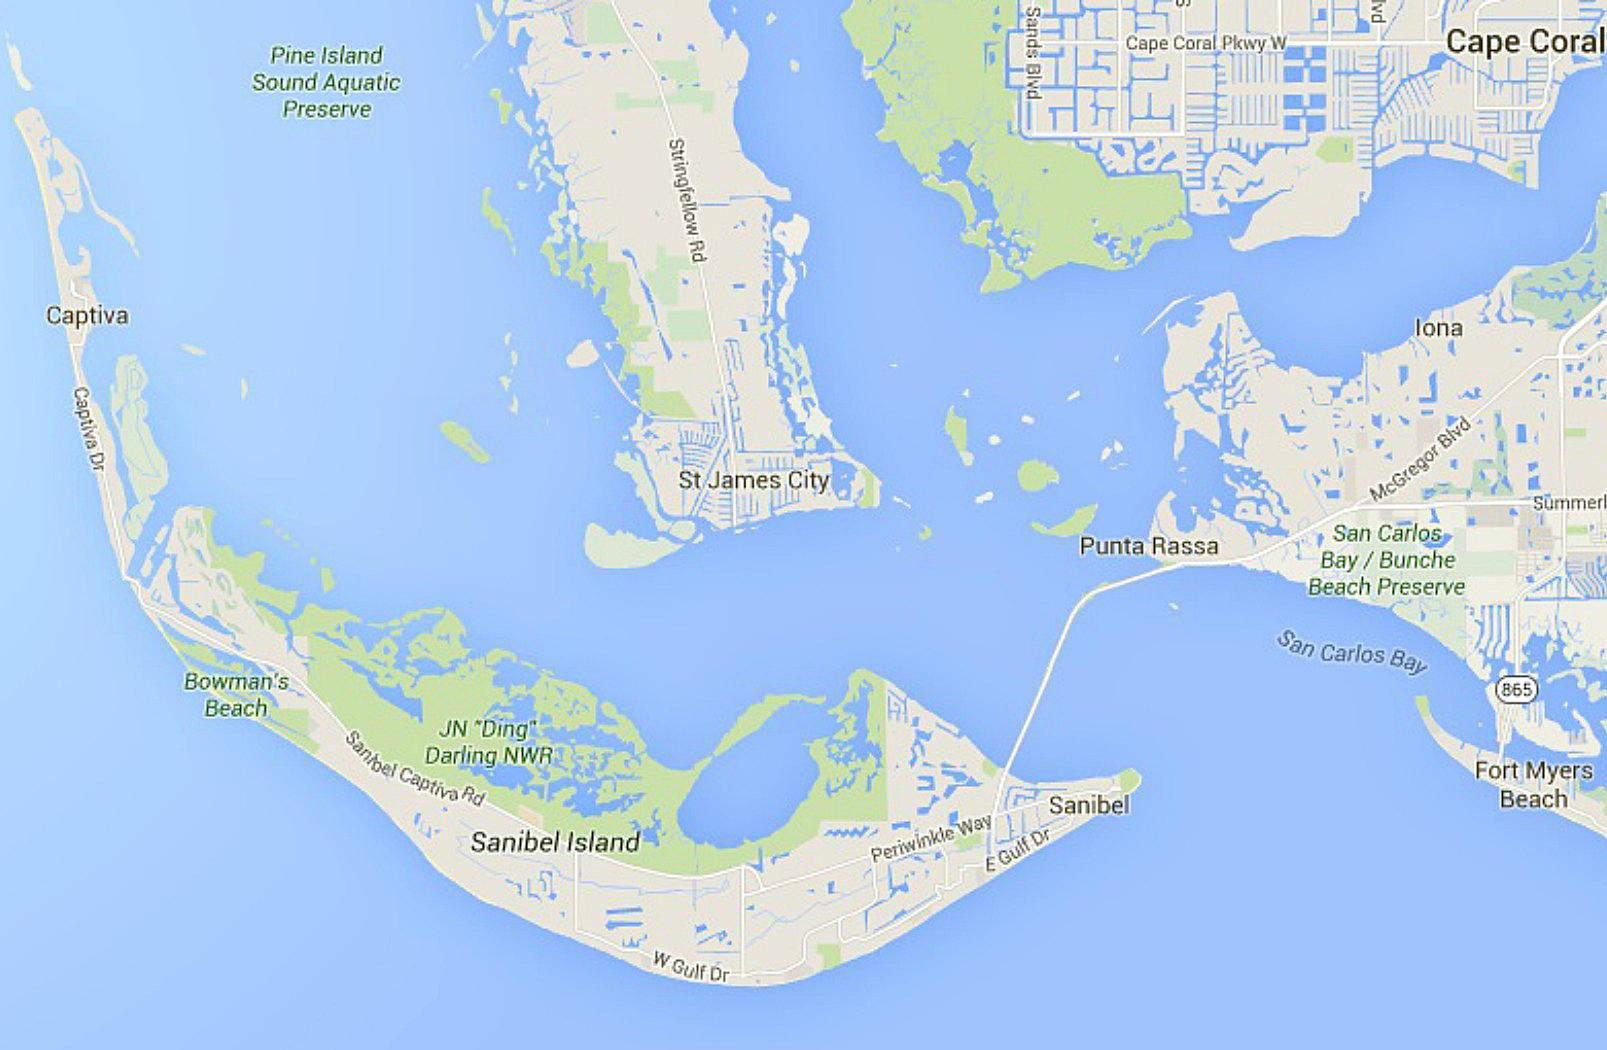 Maps Of Florida: Orlando, Tampa, Miami, Keys, And More - Map Of Tampa Florida Beaches